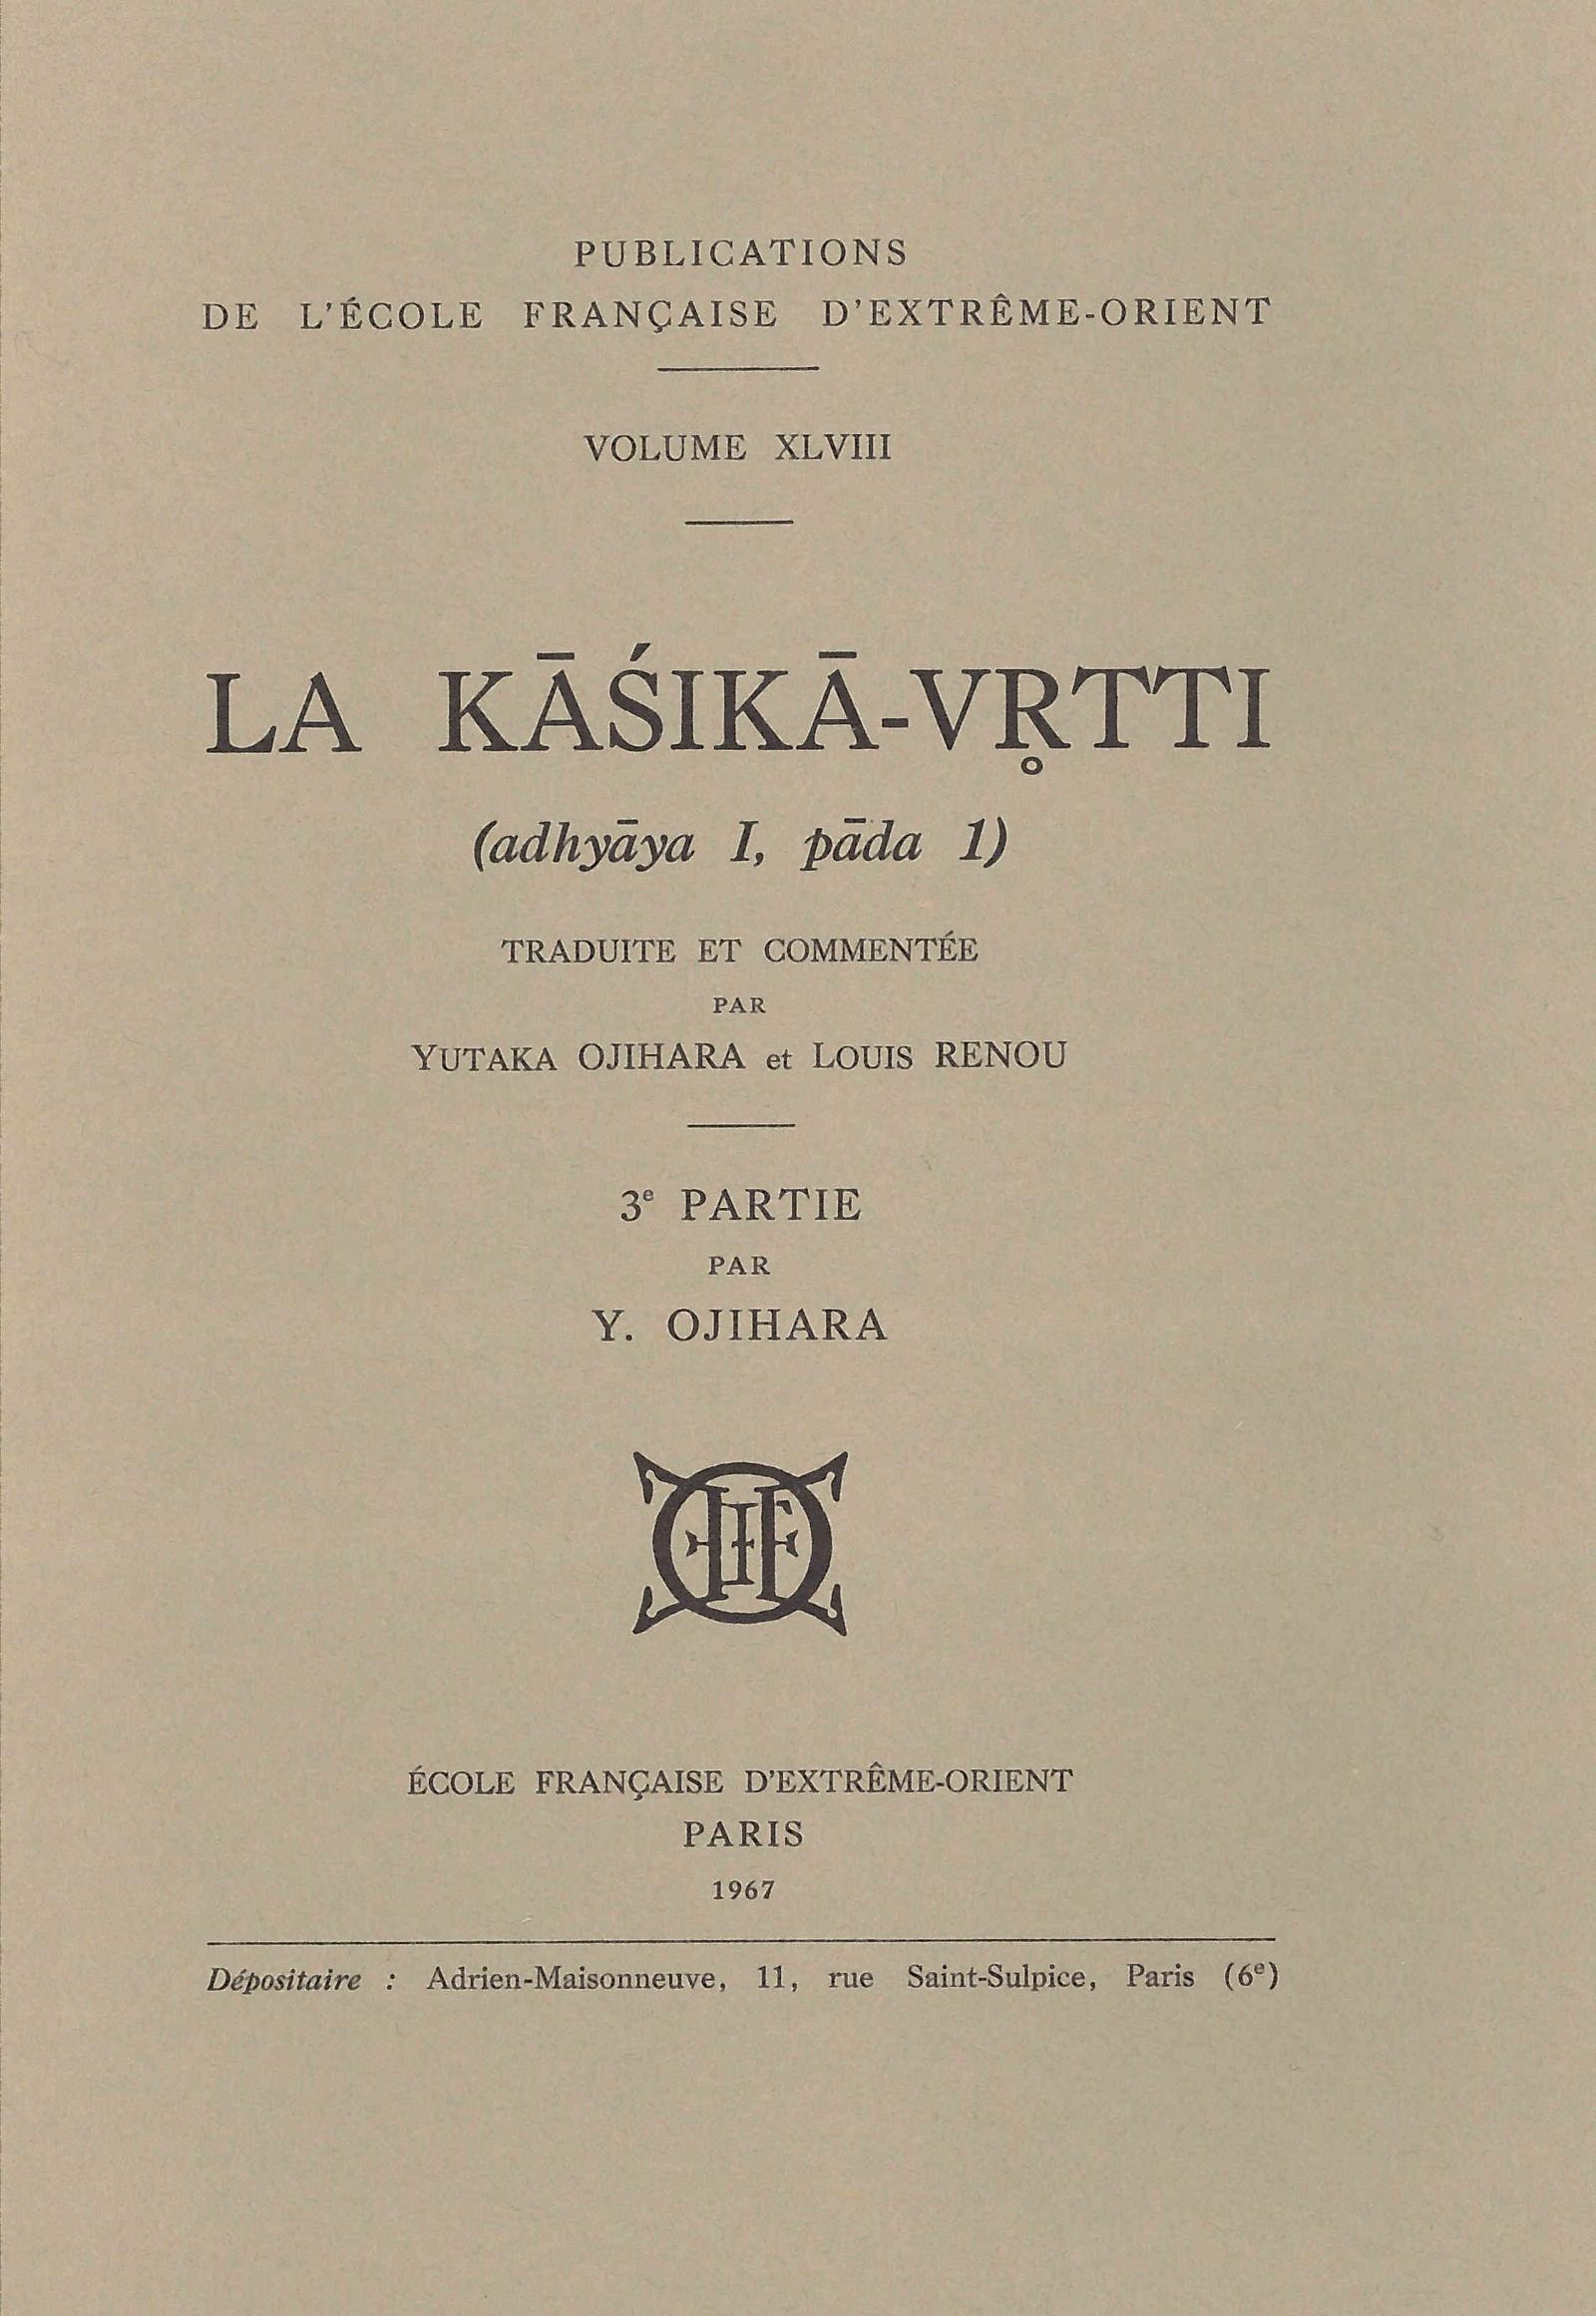 La Kāśikā-vr̥tti : Adhyāya I, pāda 1